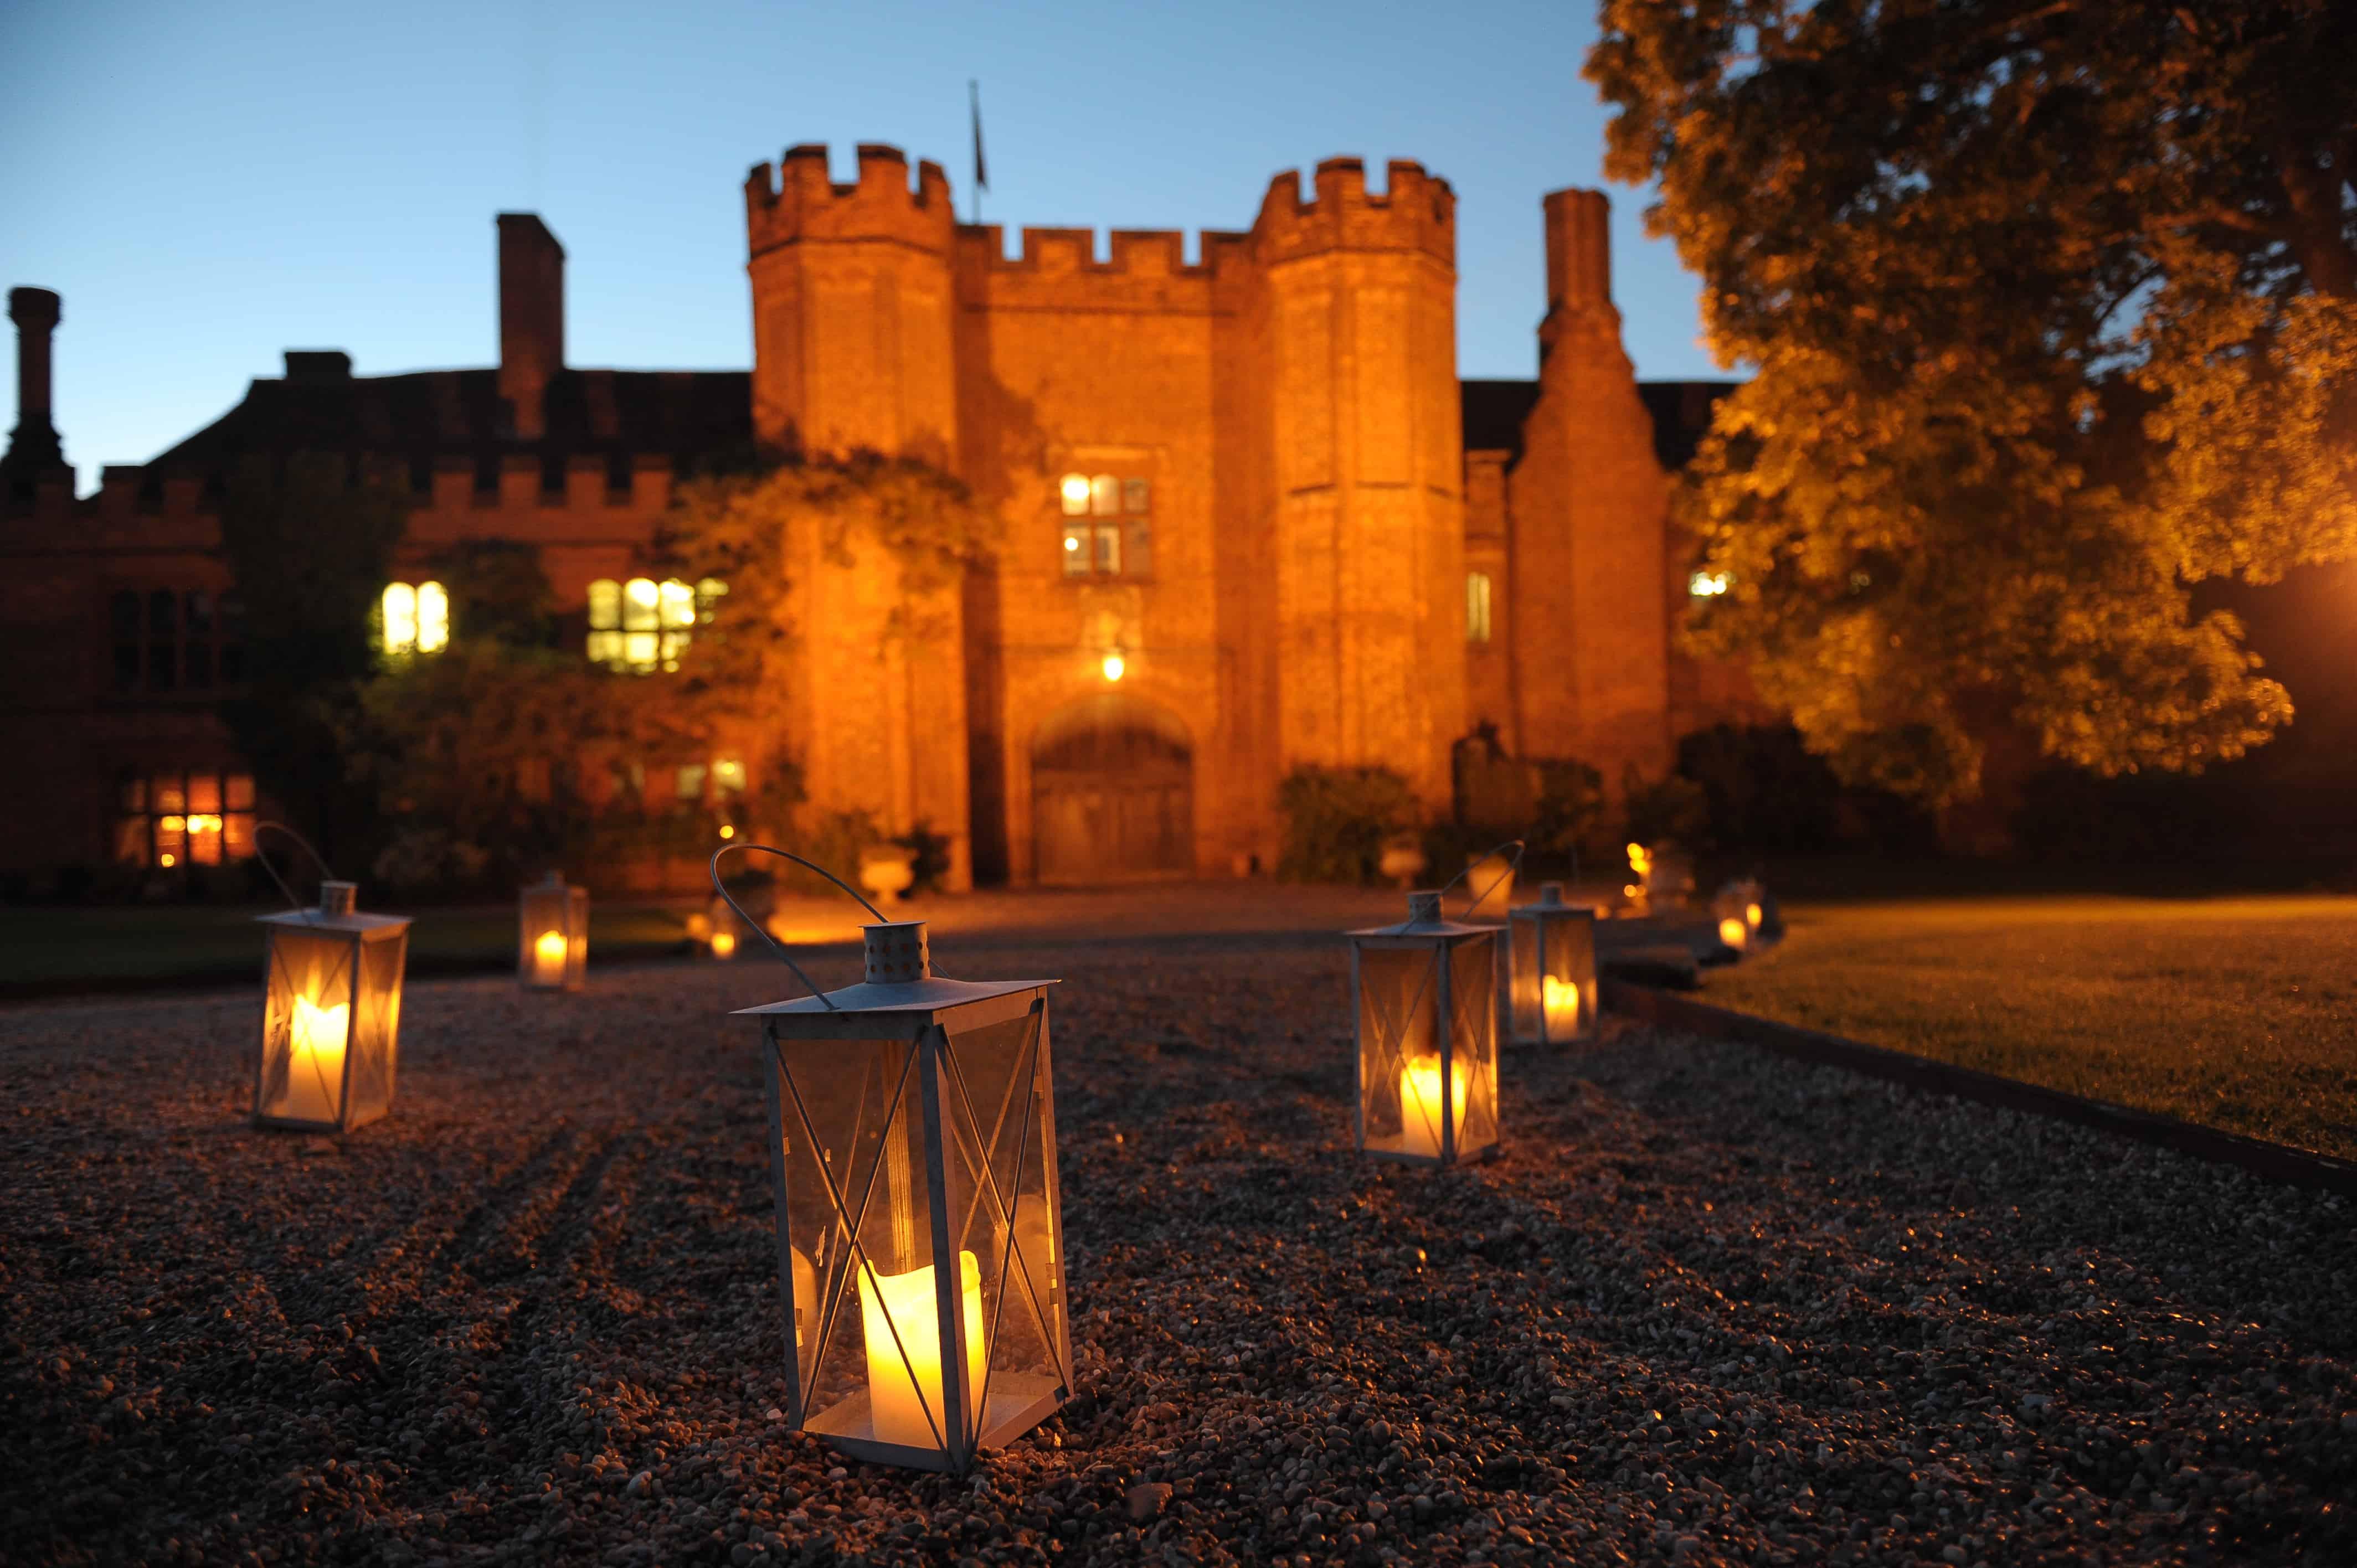 Candlelit at Night